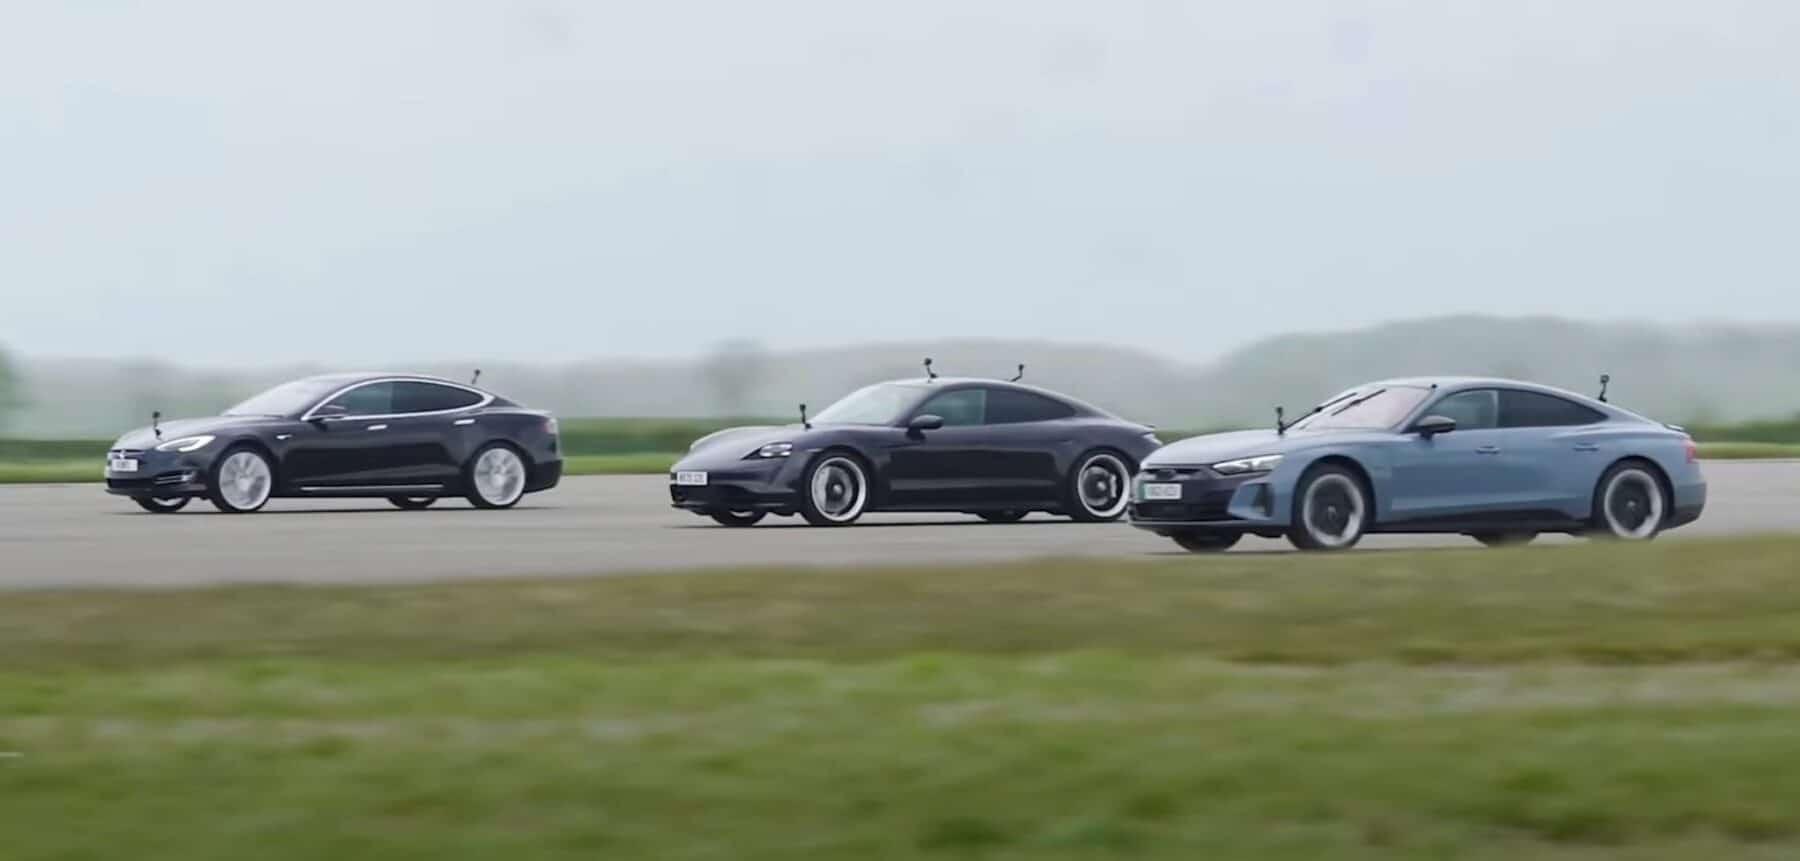 El Audi RS e-tron GT se enfrenta a sus rivales